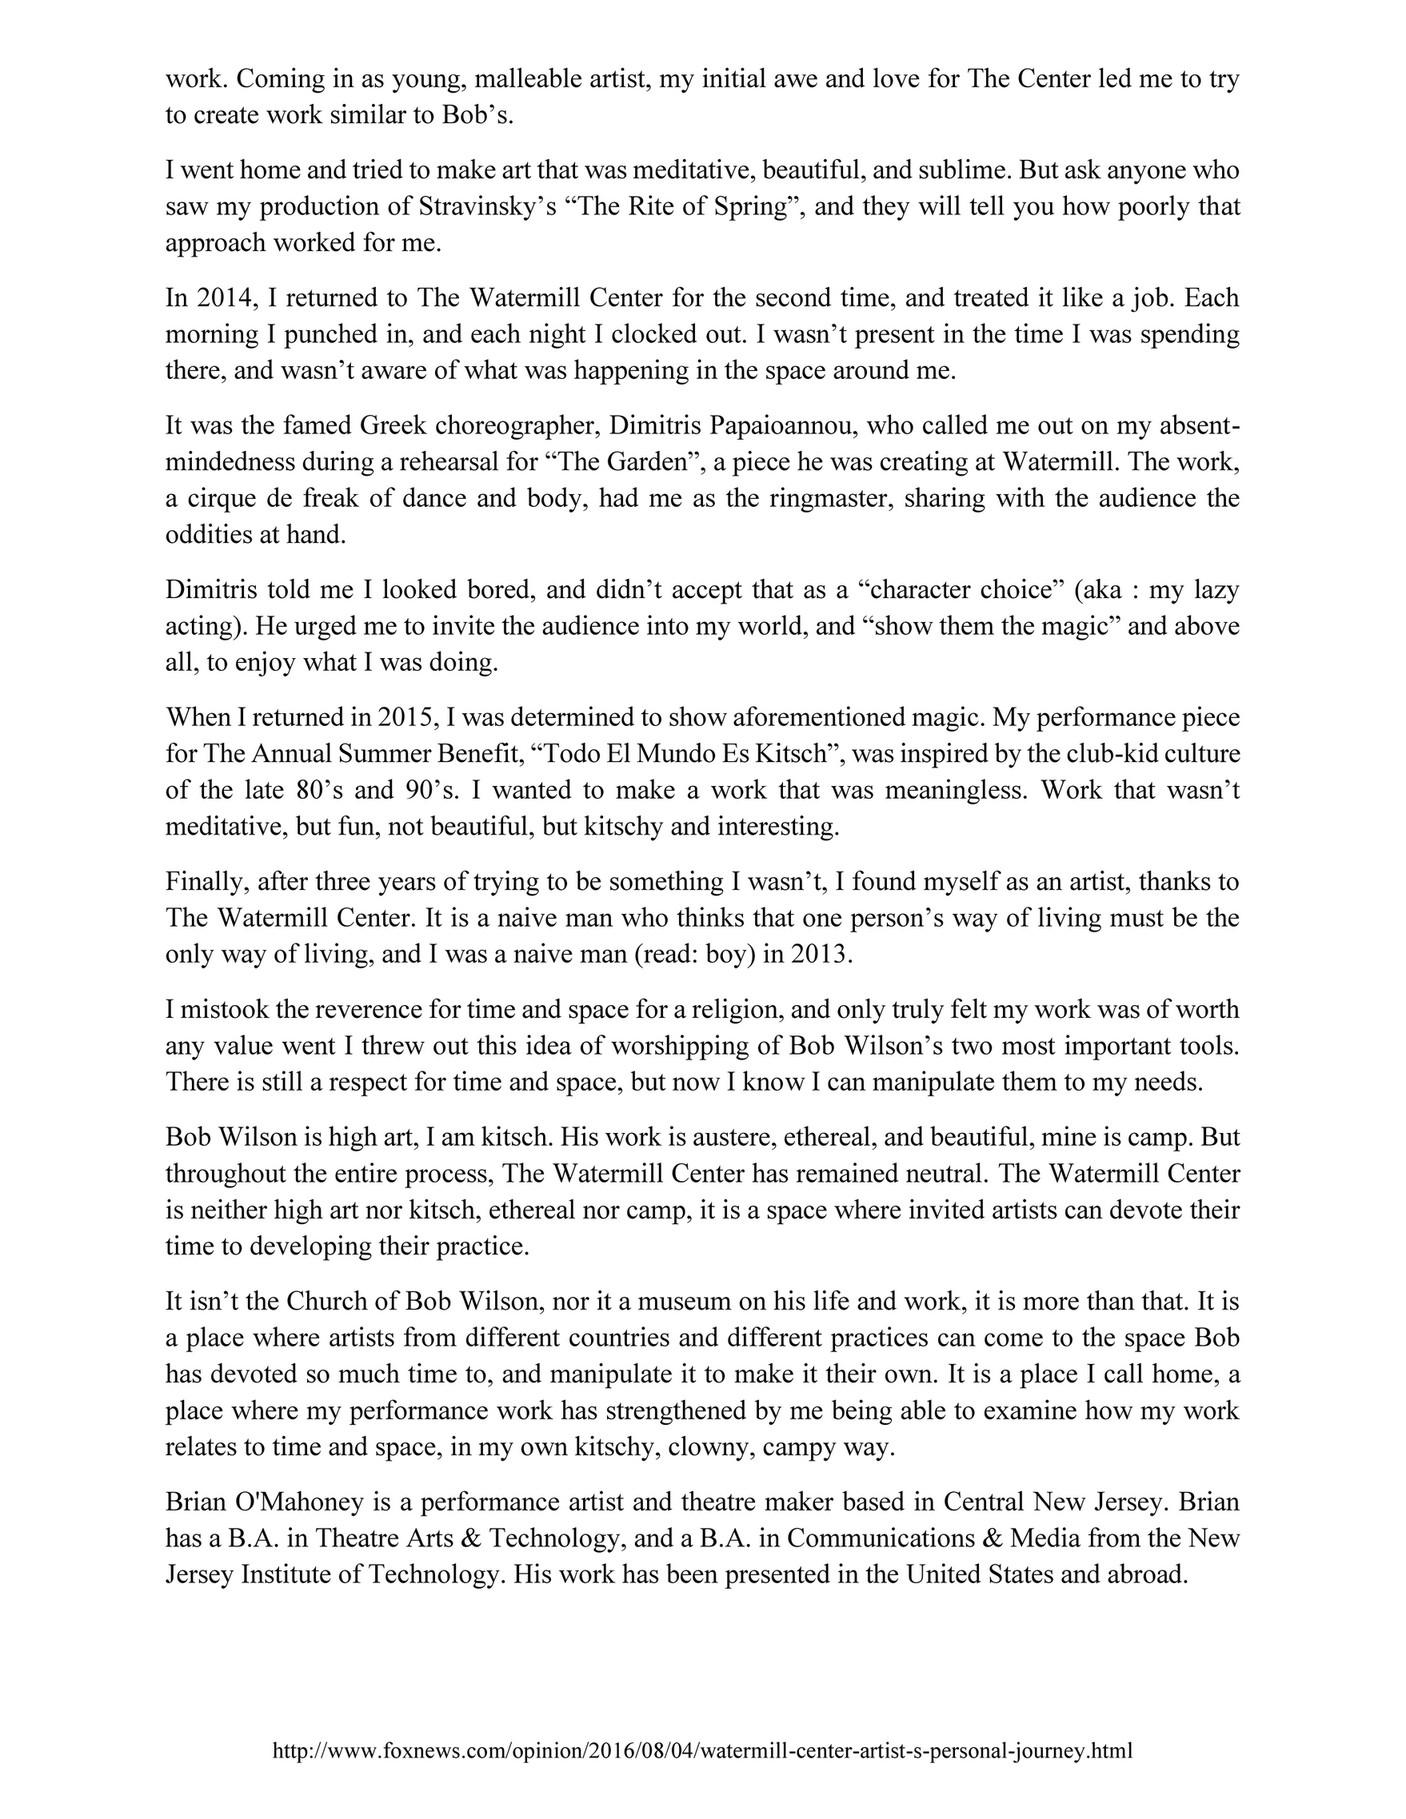 Http www foxnews com opinion 2016 08 04 watermill center artist s personal journey html